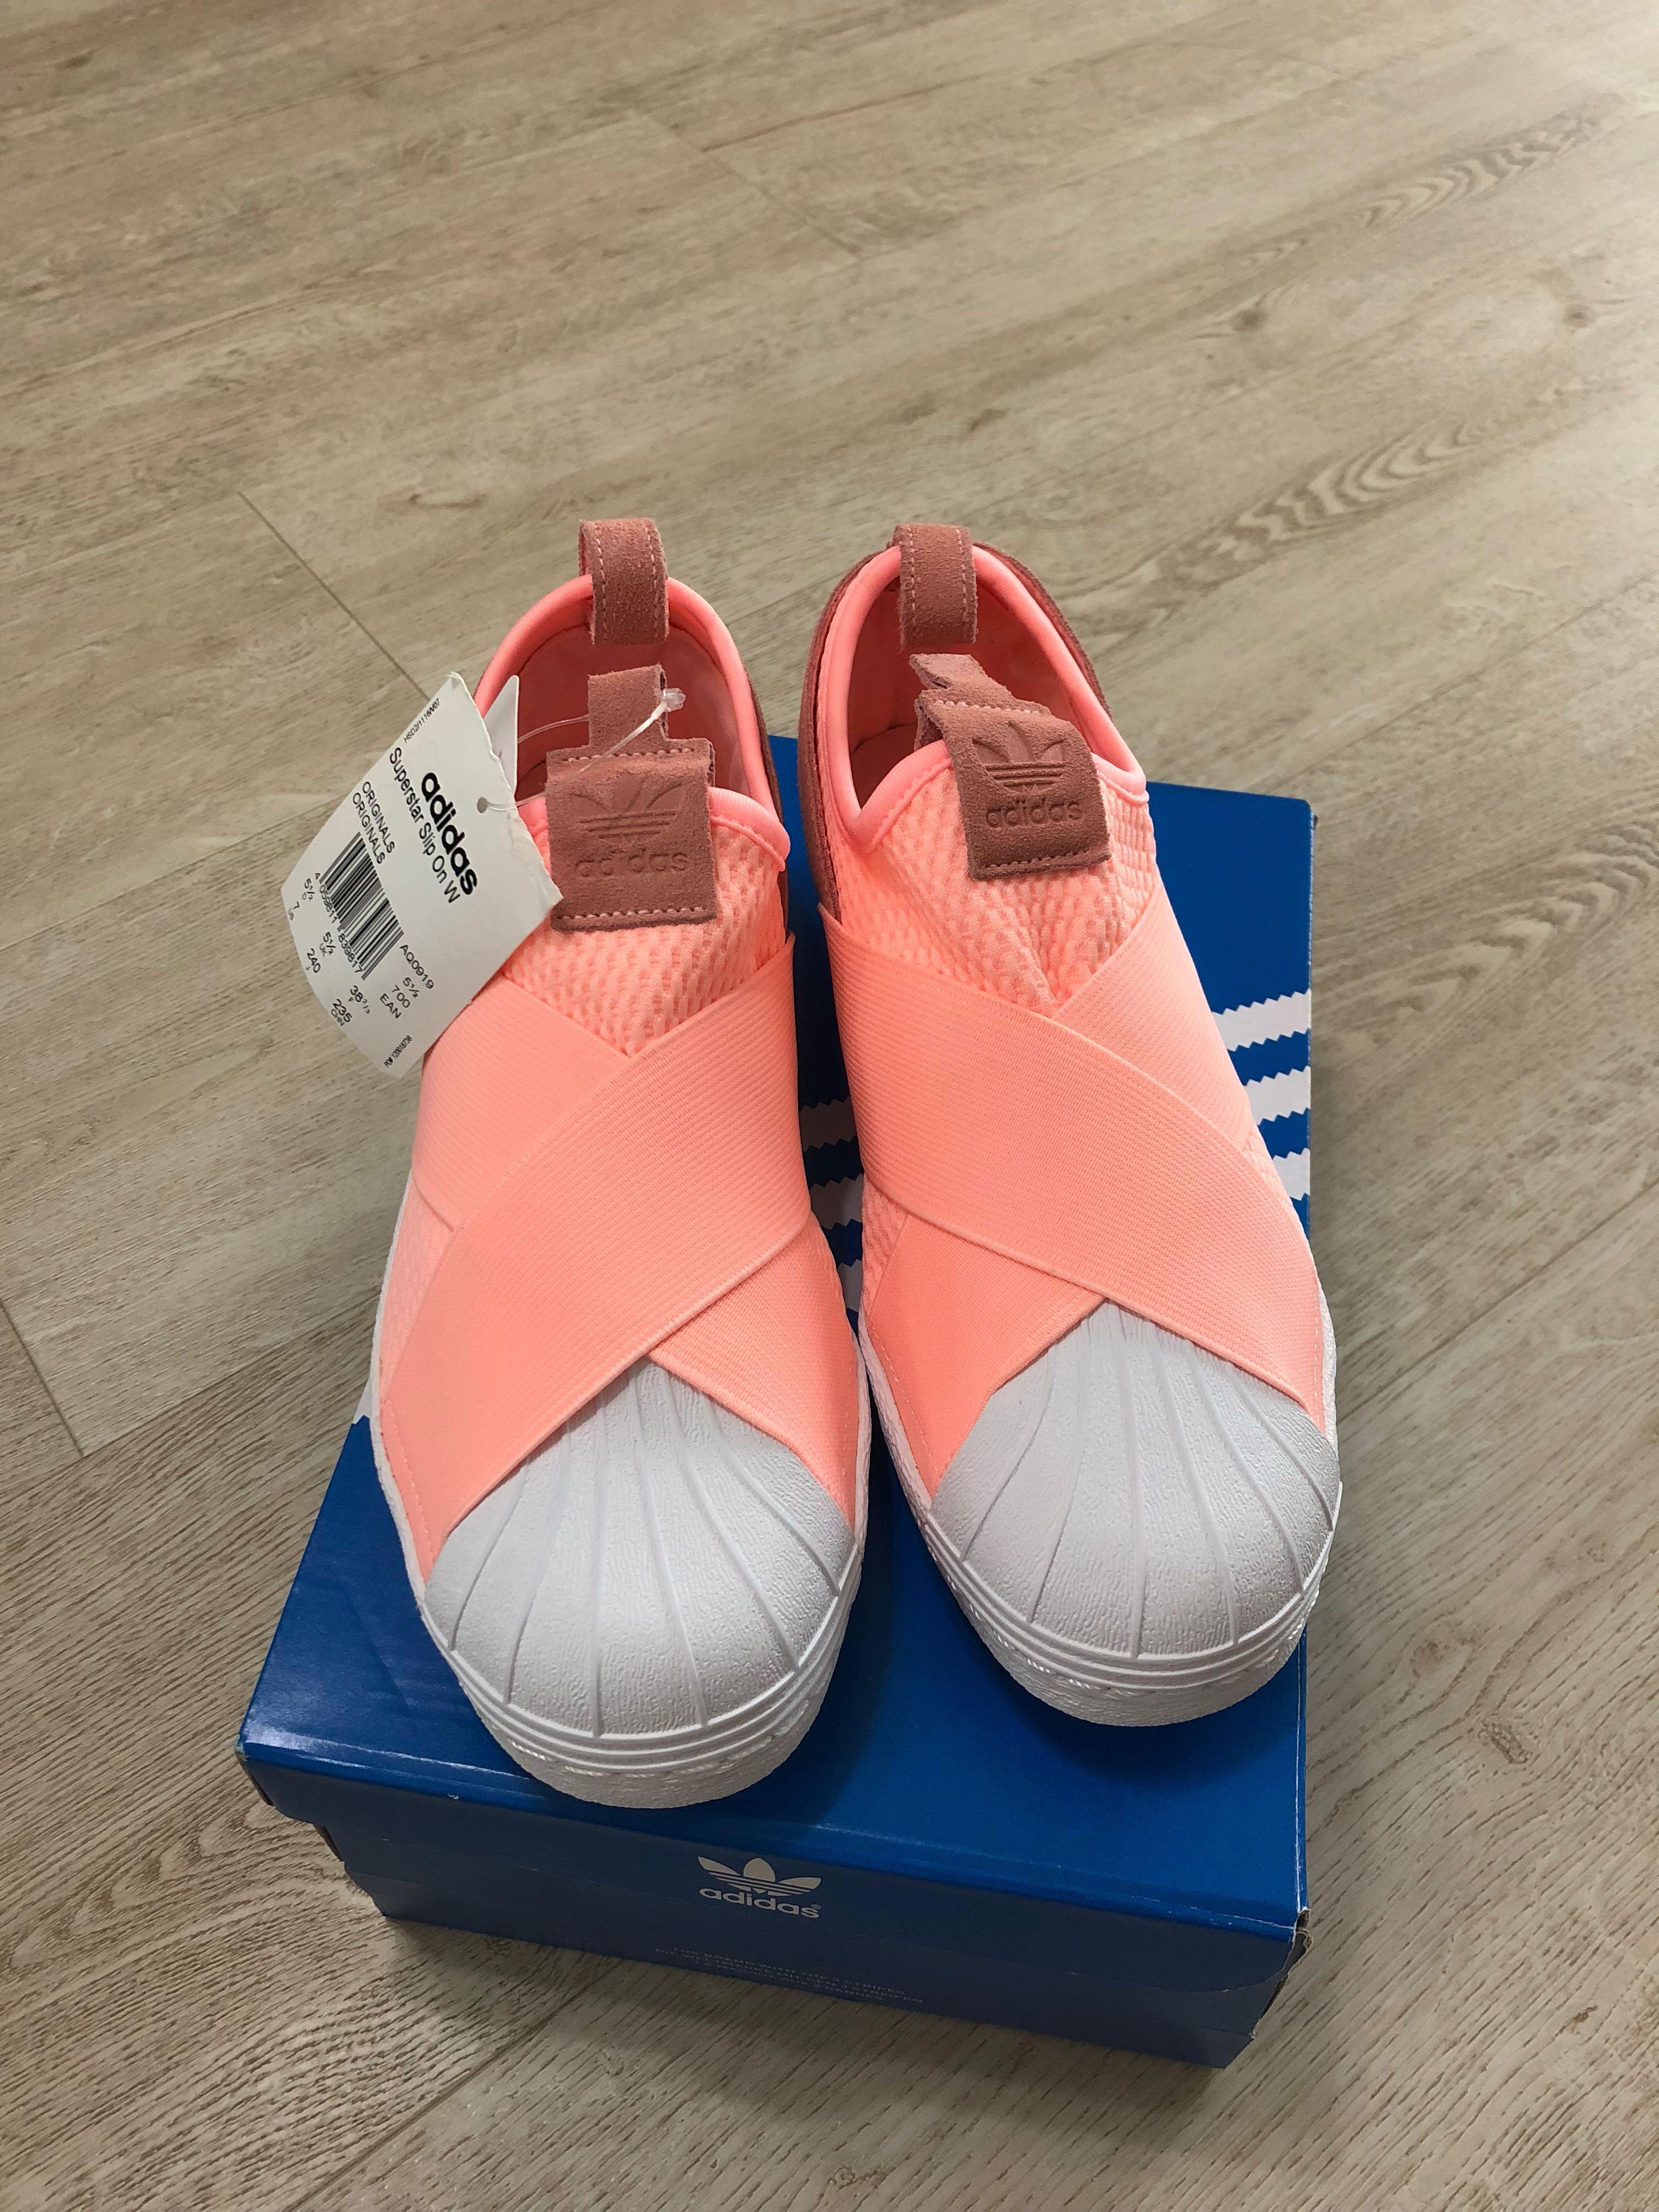 Size Us Women Adidas On Superstar Slip 7uk 5 5 UzSMpV